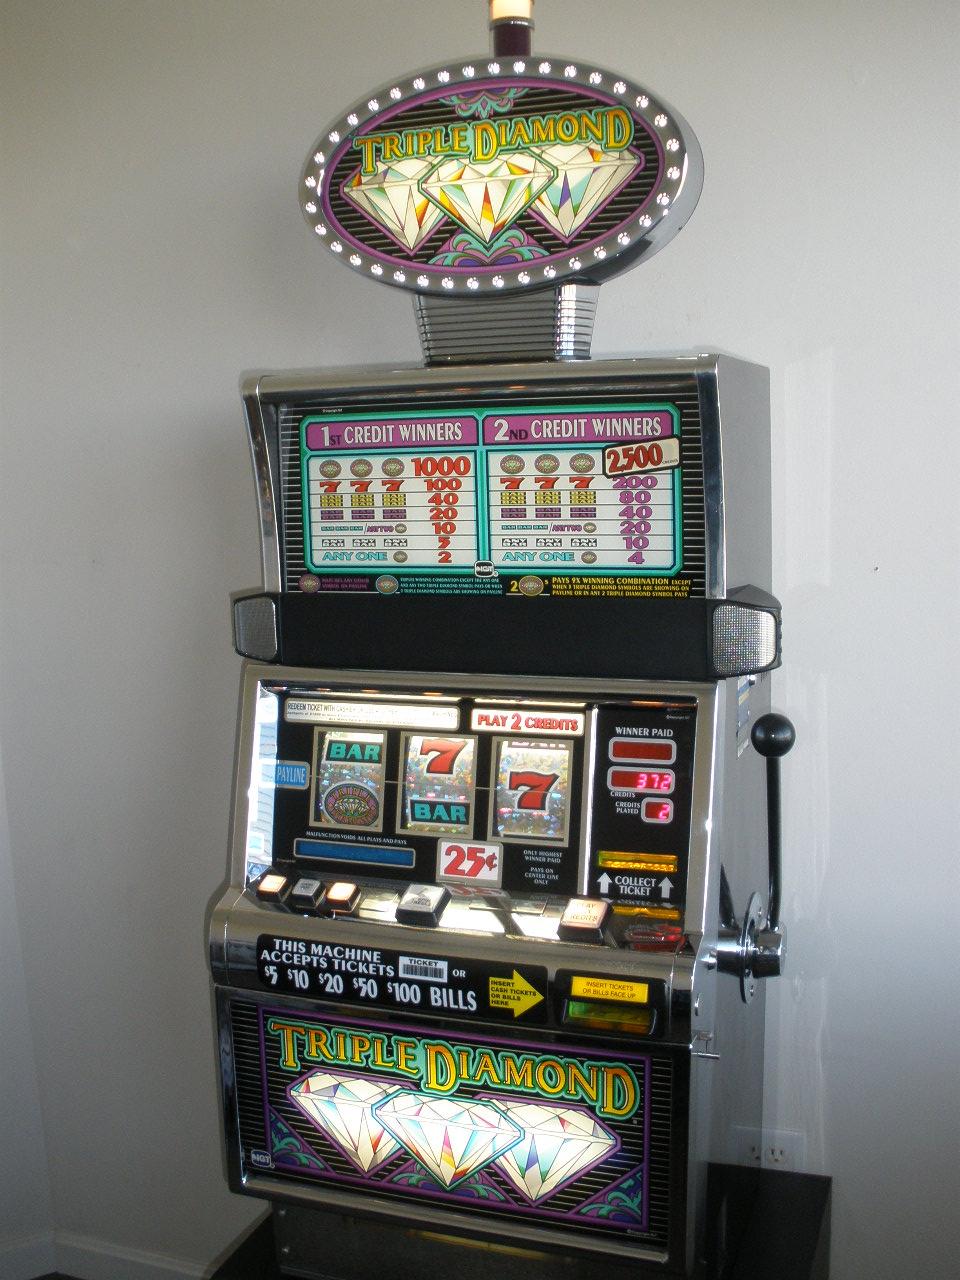 Nudging Gems Slot Machine